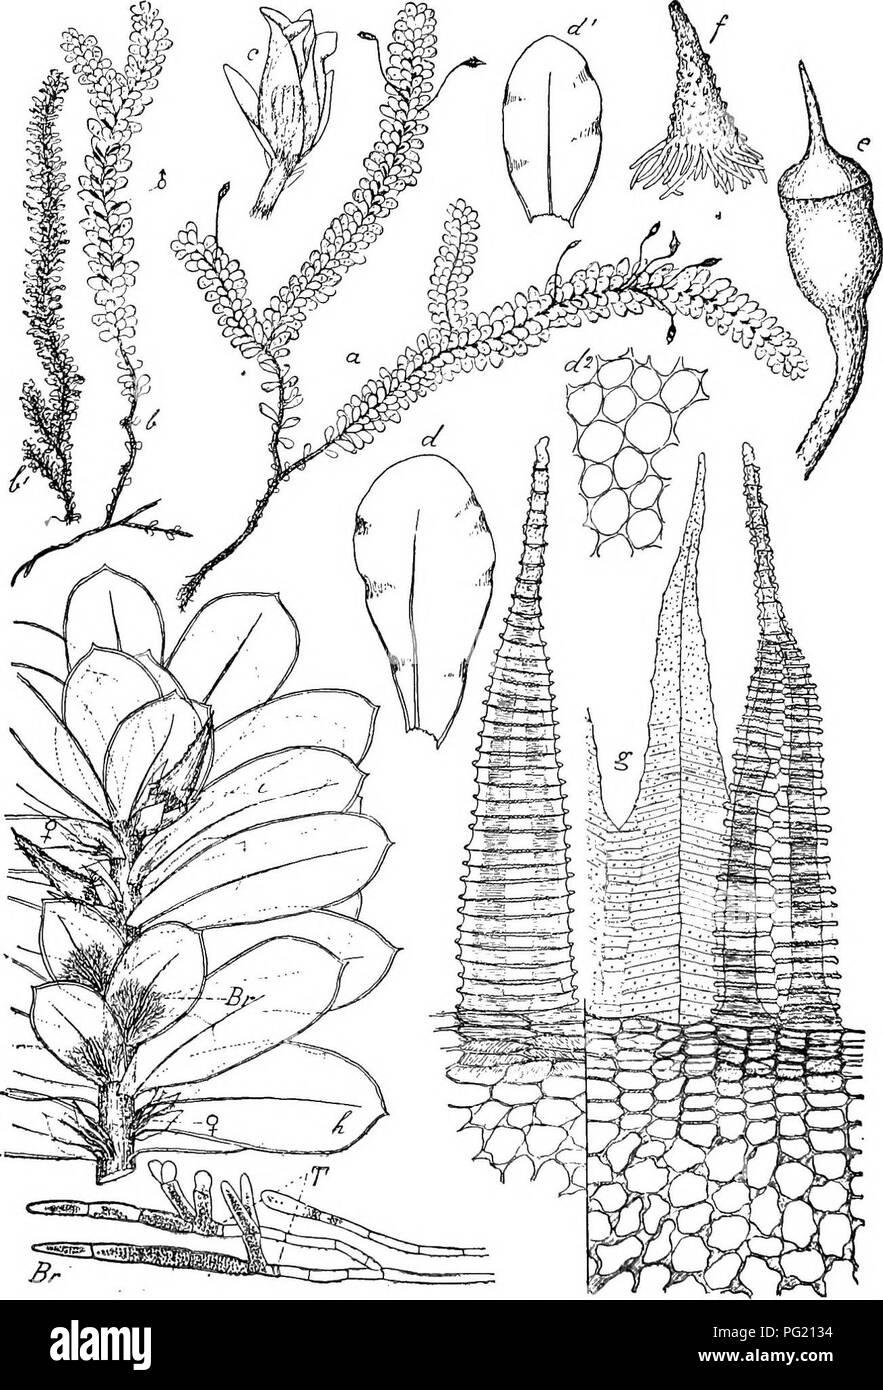 ". Flore de Buitenzorg. Botany. 996. Fig. 170. Distichopliyttum Osterwatdii FlscH. a. Habitusbild (nntiirl. Giosse). b. cj"" Pflanzo. }' ^f Pflanze trocken (natiu'l. Grosso) c. d"" Bliite. d. Soitliolies, d'- vovderes Laubblatt '-P. rf"". Blattzellen ^-^. c. Sporo- gon V- /• Haube '/. g. Povistom dorsal, Zahu links ventral gesohon —^. J), tortile V. D. B. et Lac. h, Sprossendo dos Stengels mlt termiaalem Bliitenstand. i. junges Sporogon. Br. Blattbiirtige Brutfiidon mit T. = Tragerzellen ^7—.. Please note that these images are extracted from scanned page images that may have been d Stock Photo"